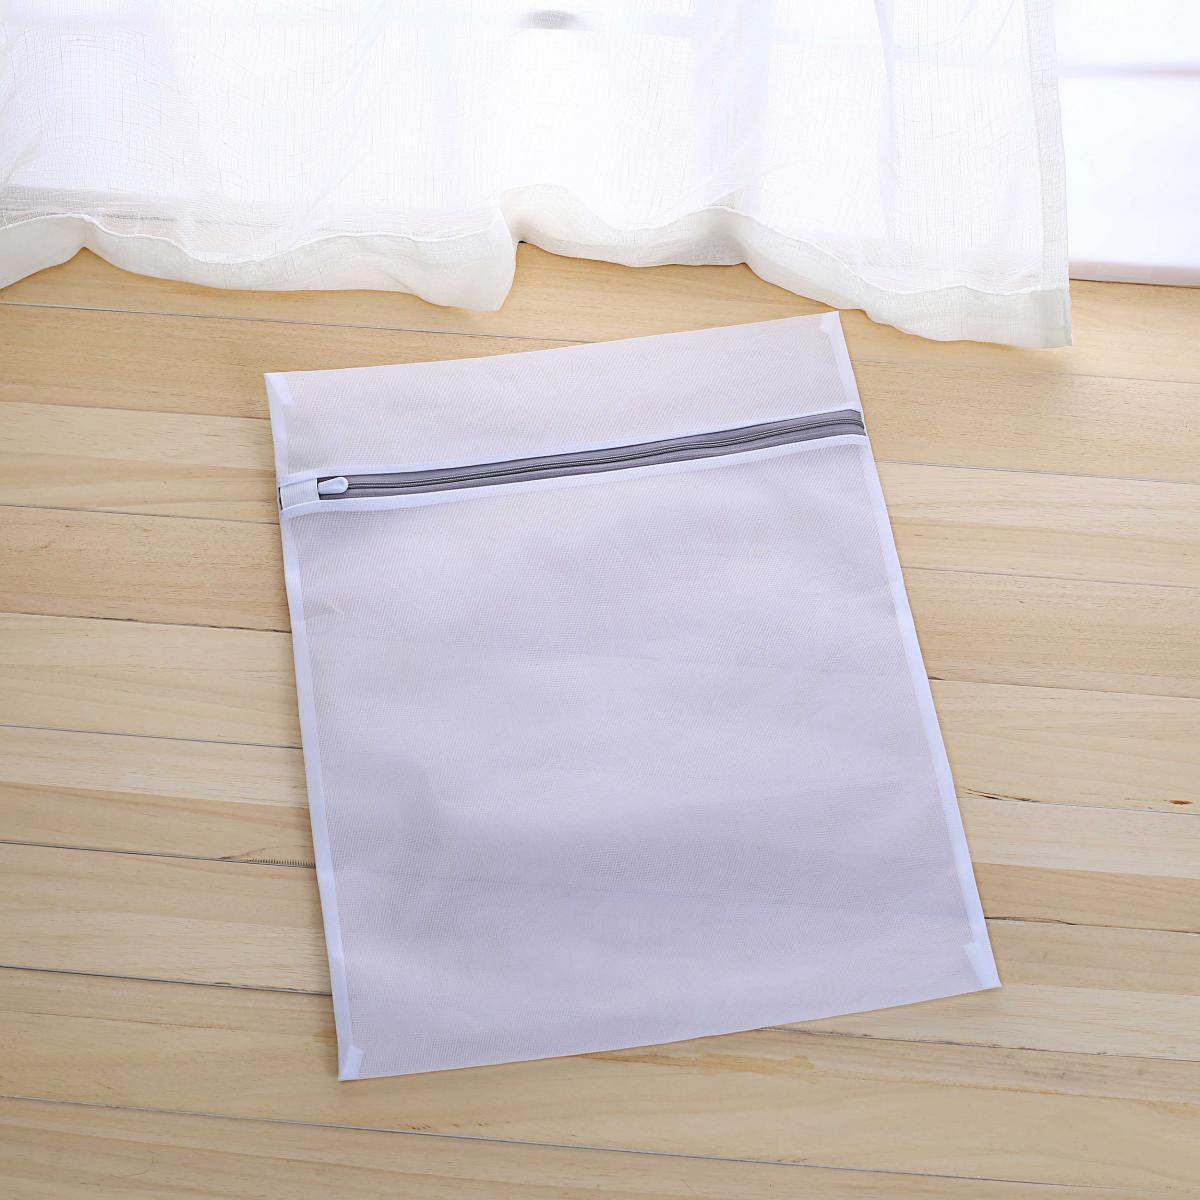 Ihomagic Laundry Net Bag Washing Protective For Washing Machine